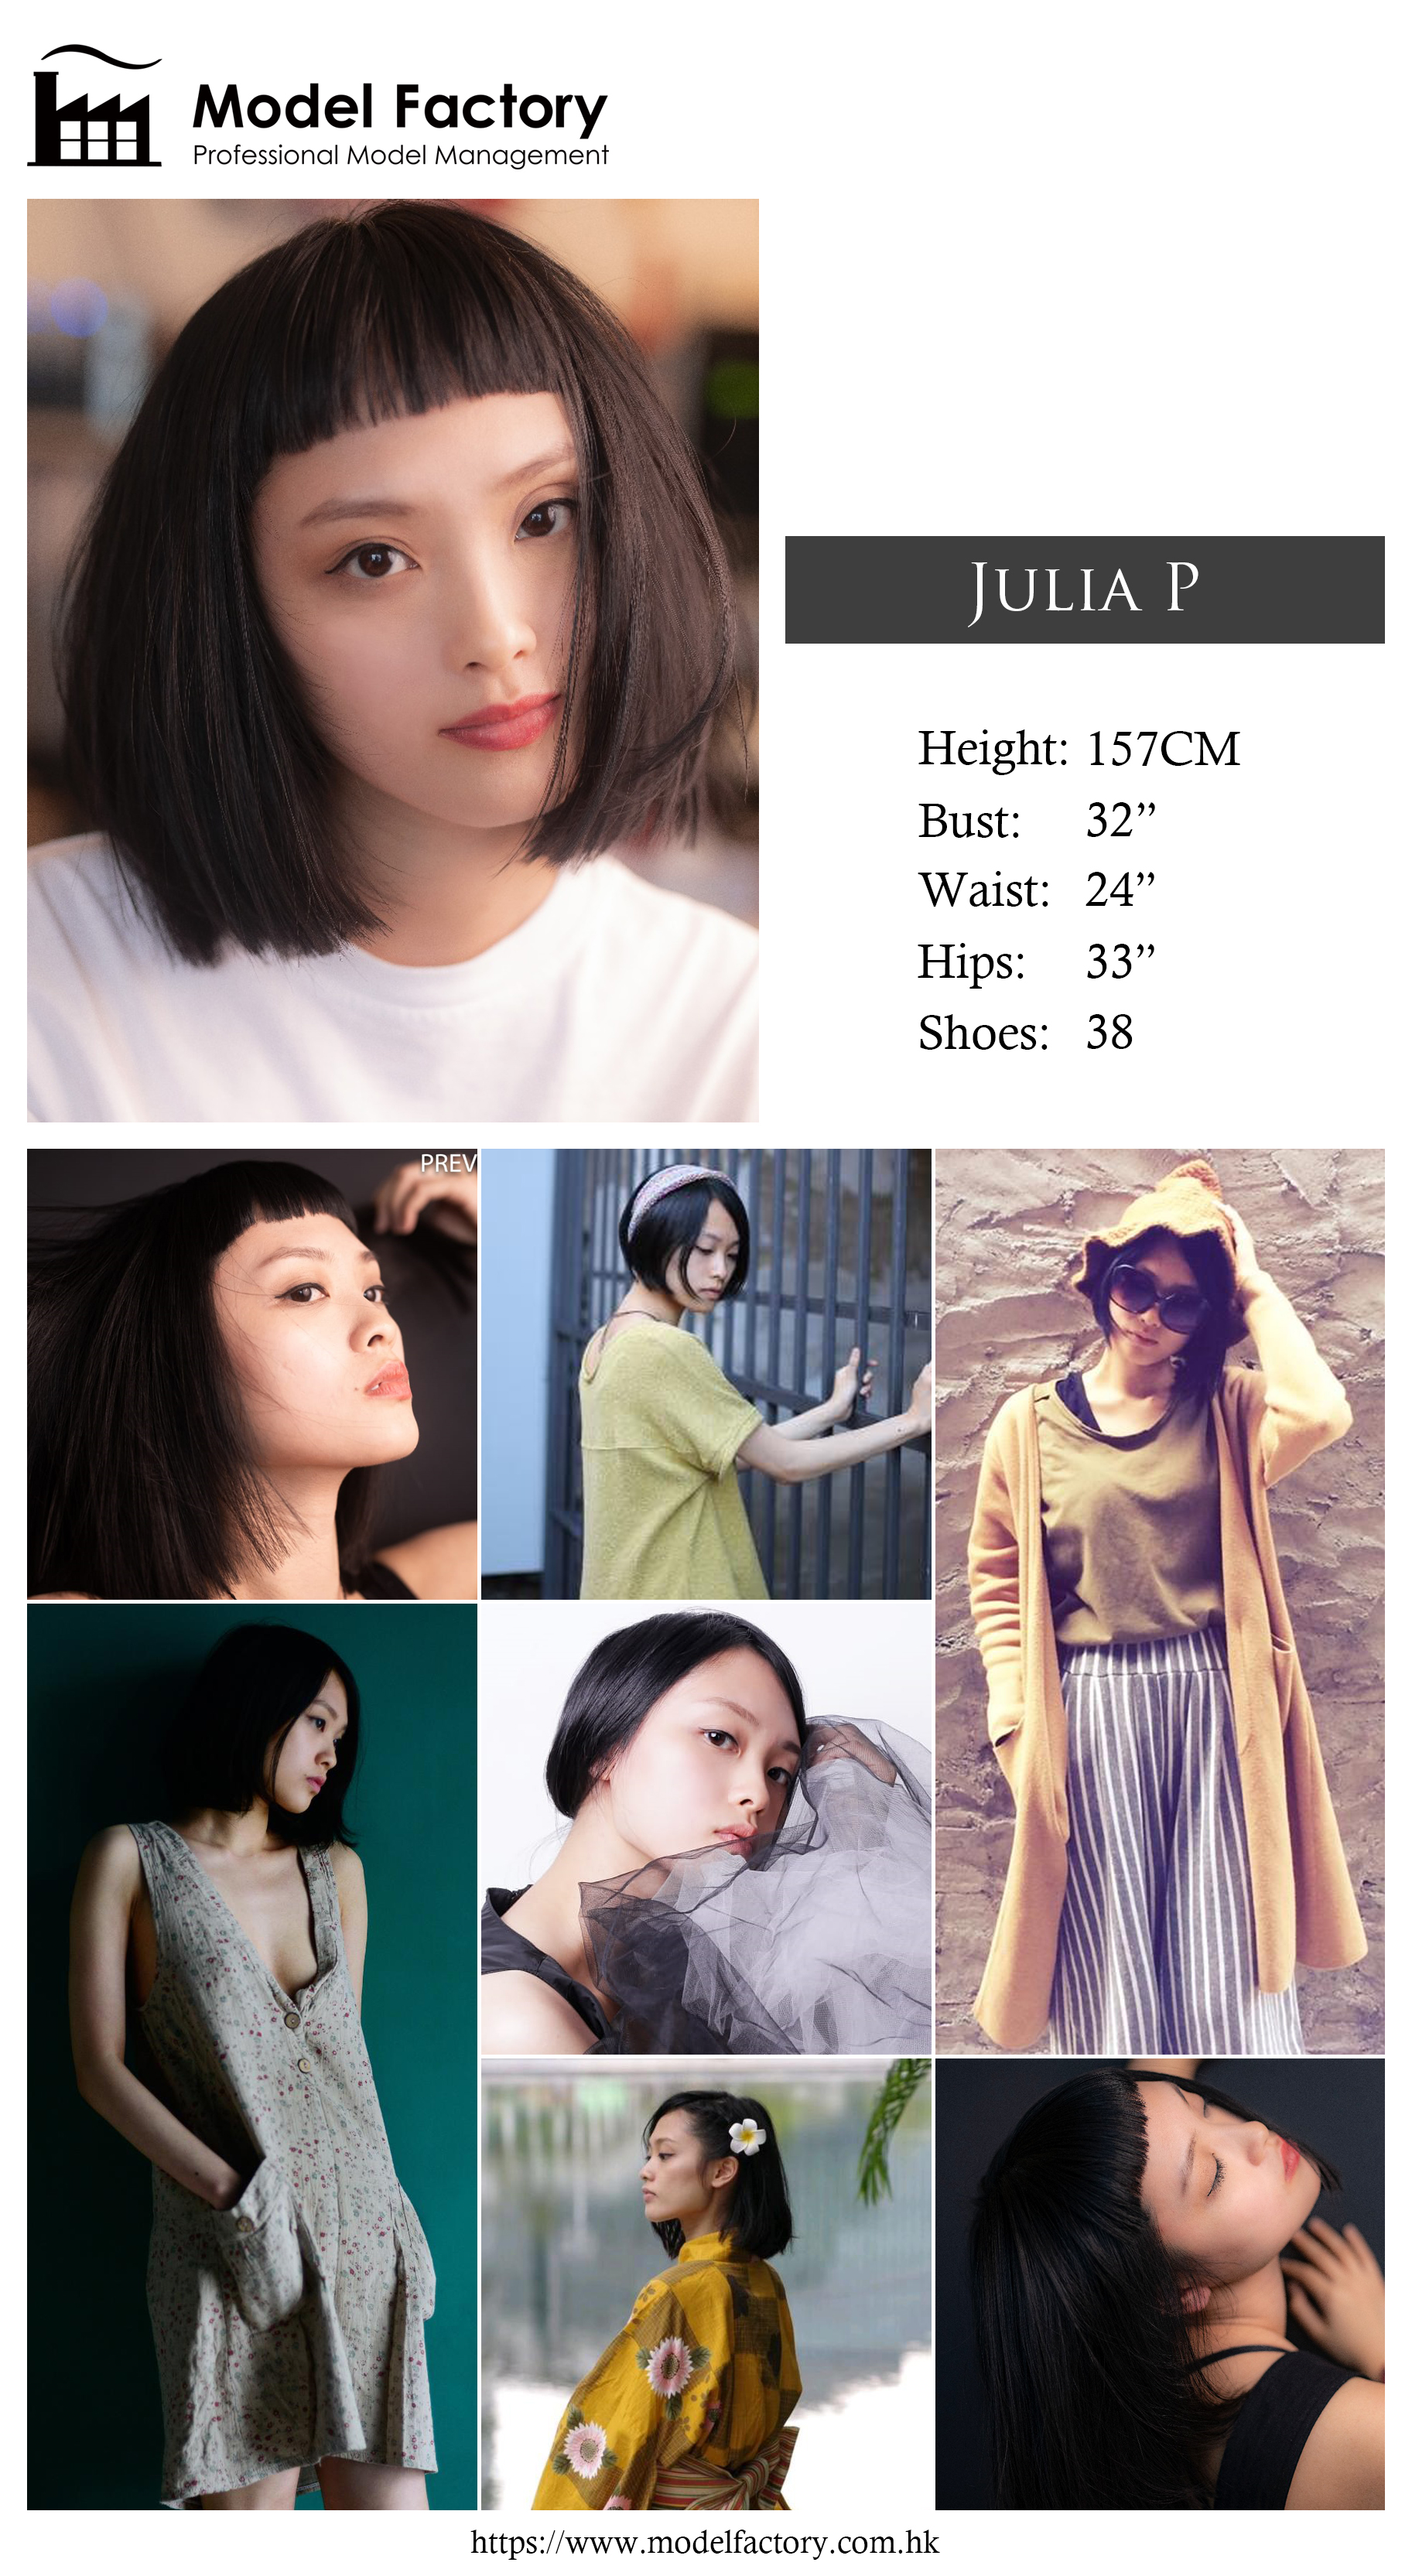 Model Factory Hong Kong Female Model JuliaP